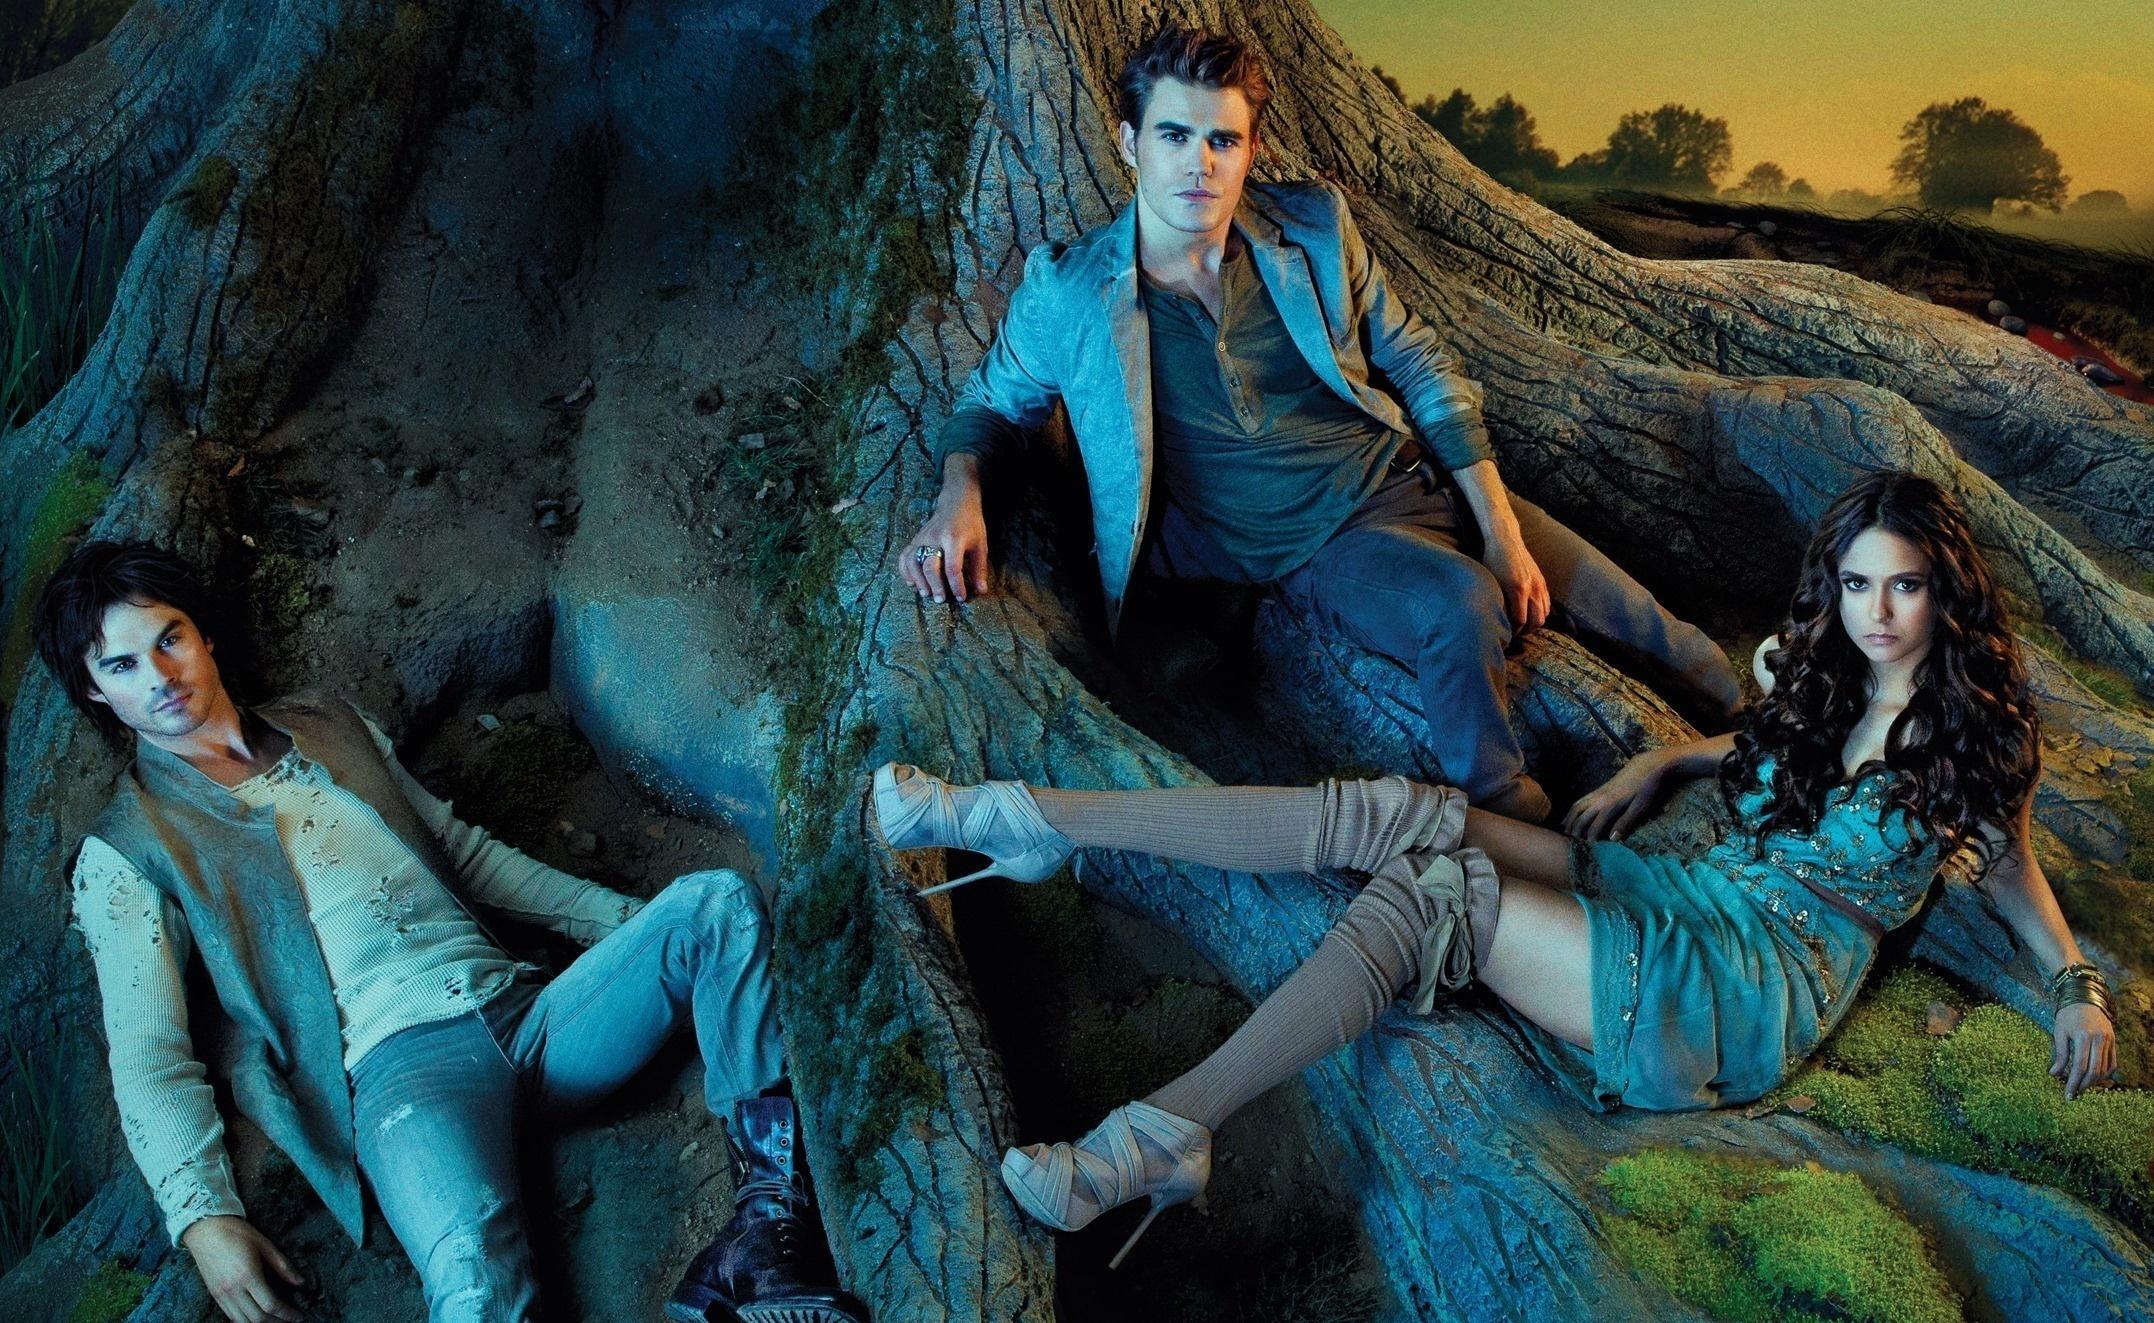 Vampire Diaries Hd Wallpapers 1366x768 The Vampire Diaries Hd Wallpaper Background Image